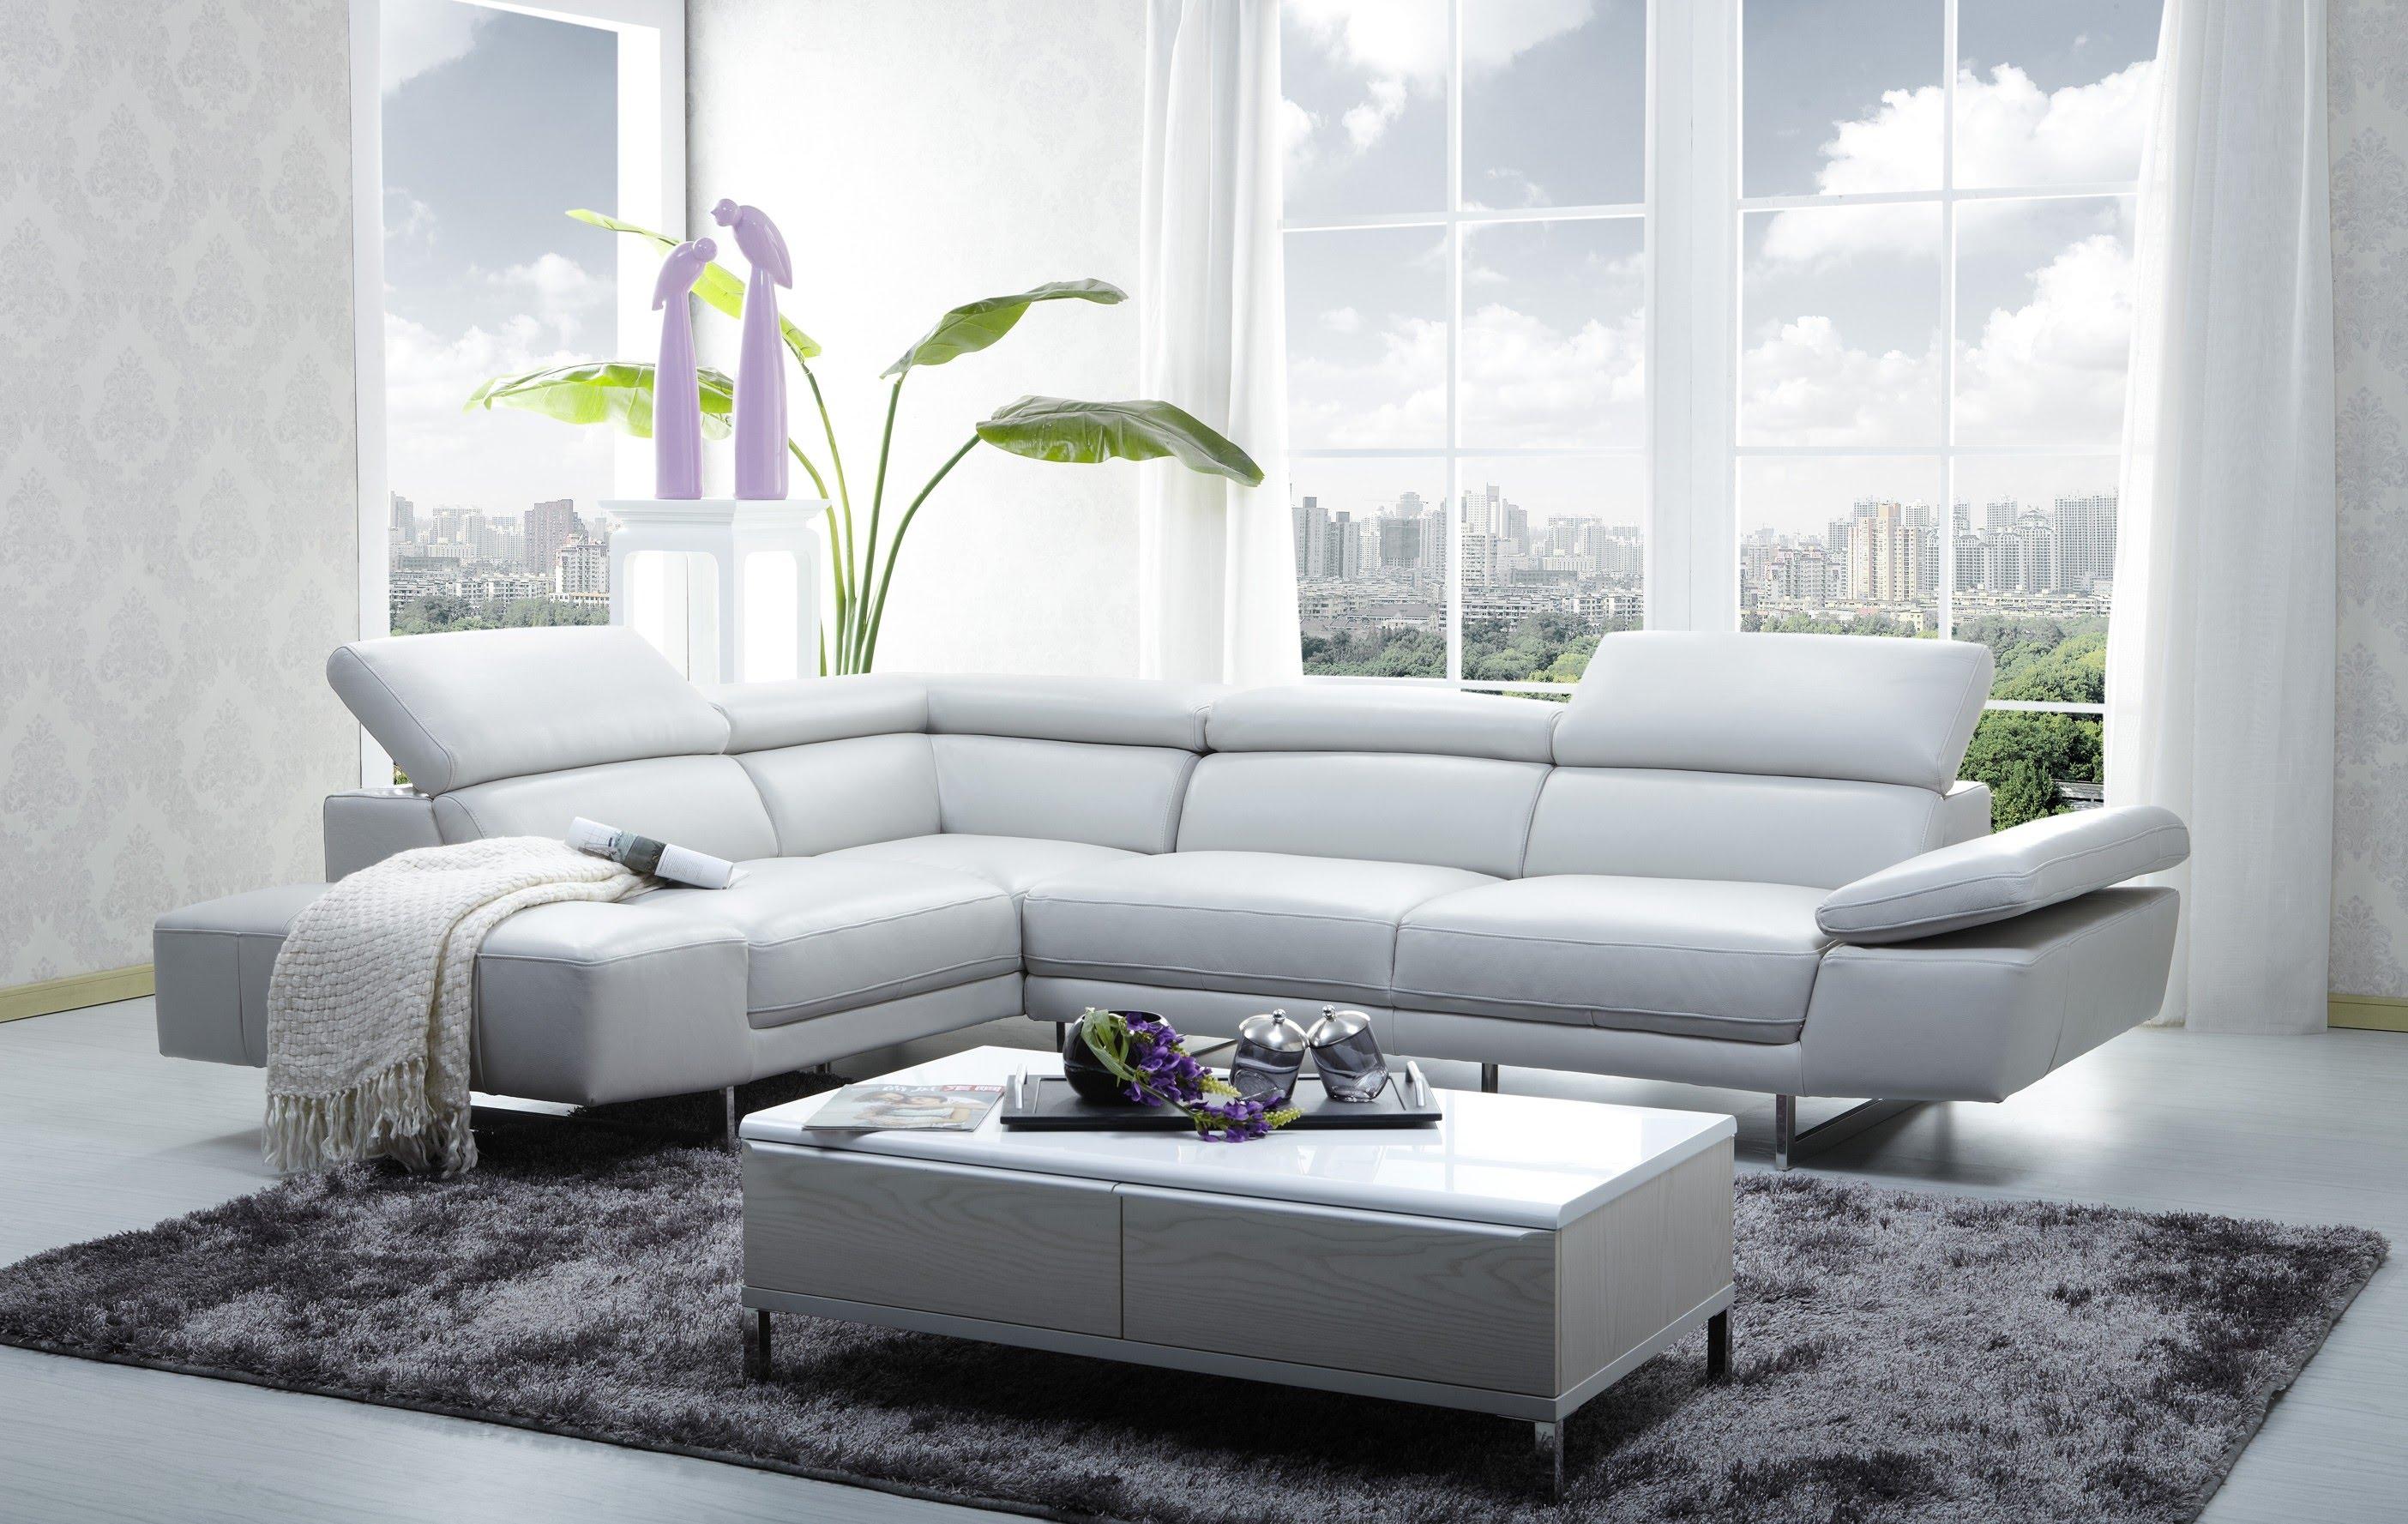 design sofas sofa design ideas - youtube JCKUPAV